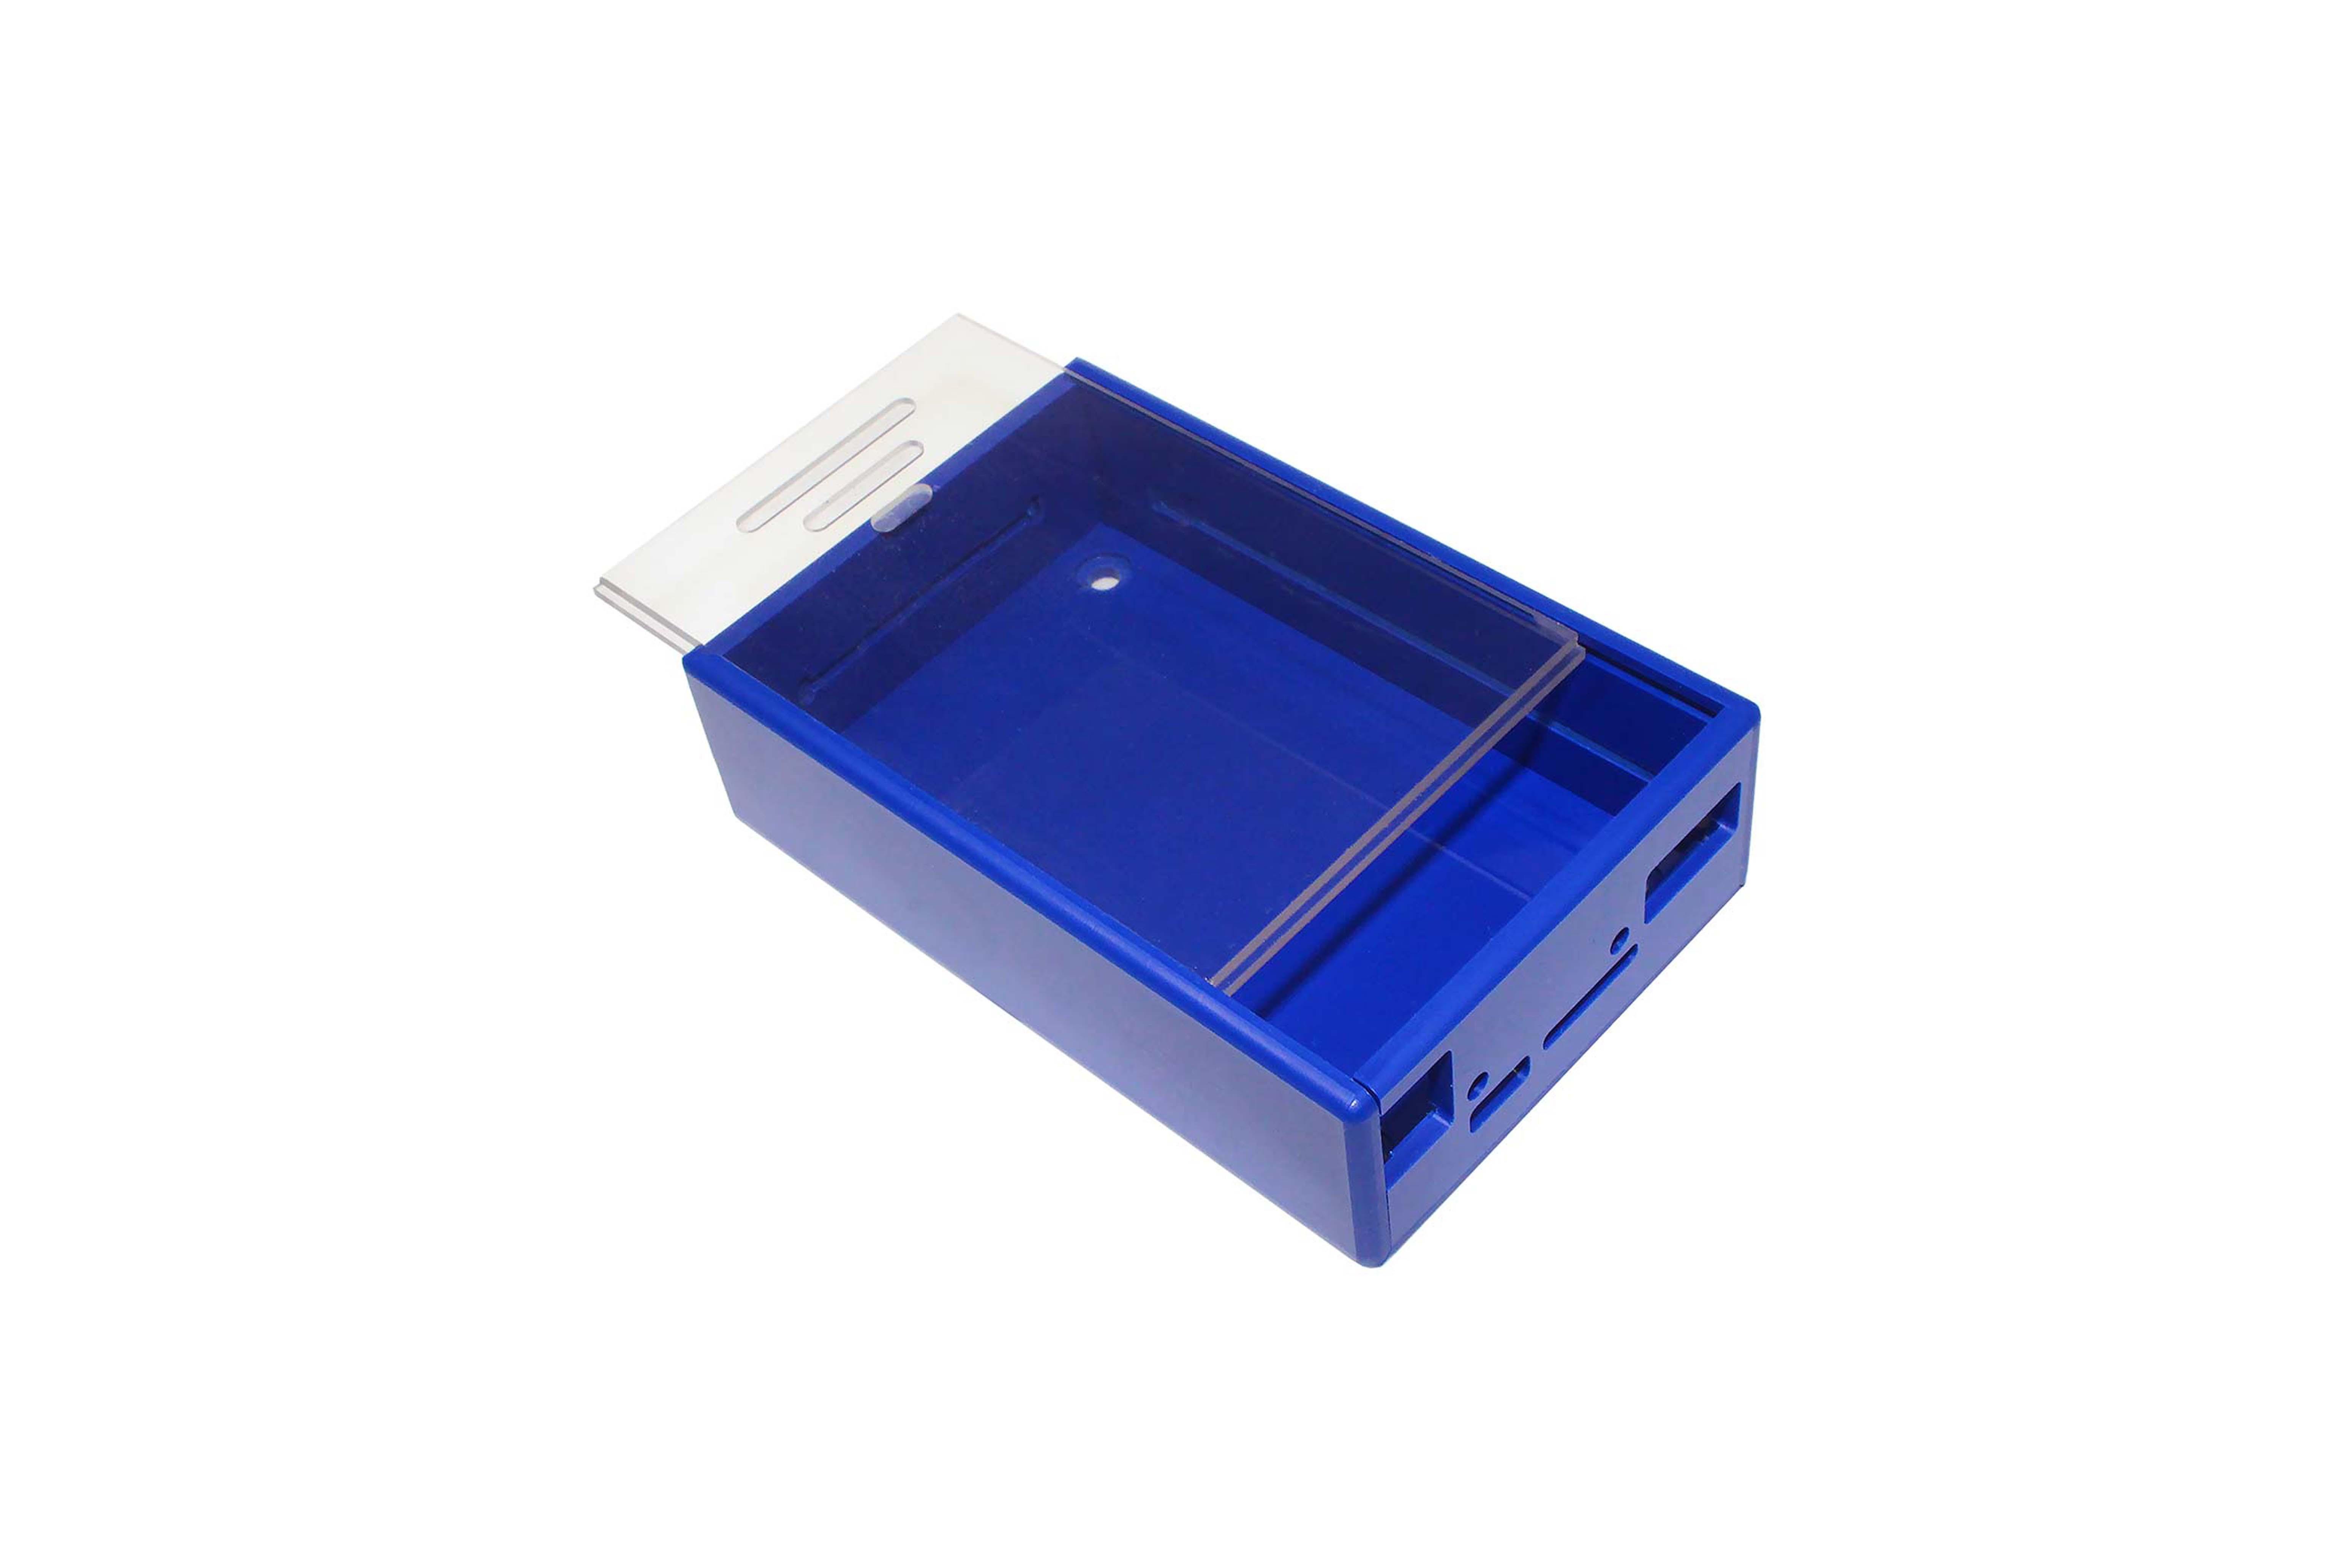 Boîtier bleu DesignSpark Beaglebone, Bleu/Transparent